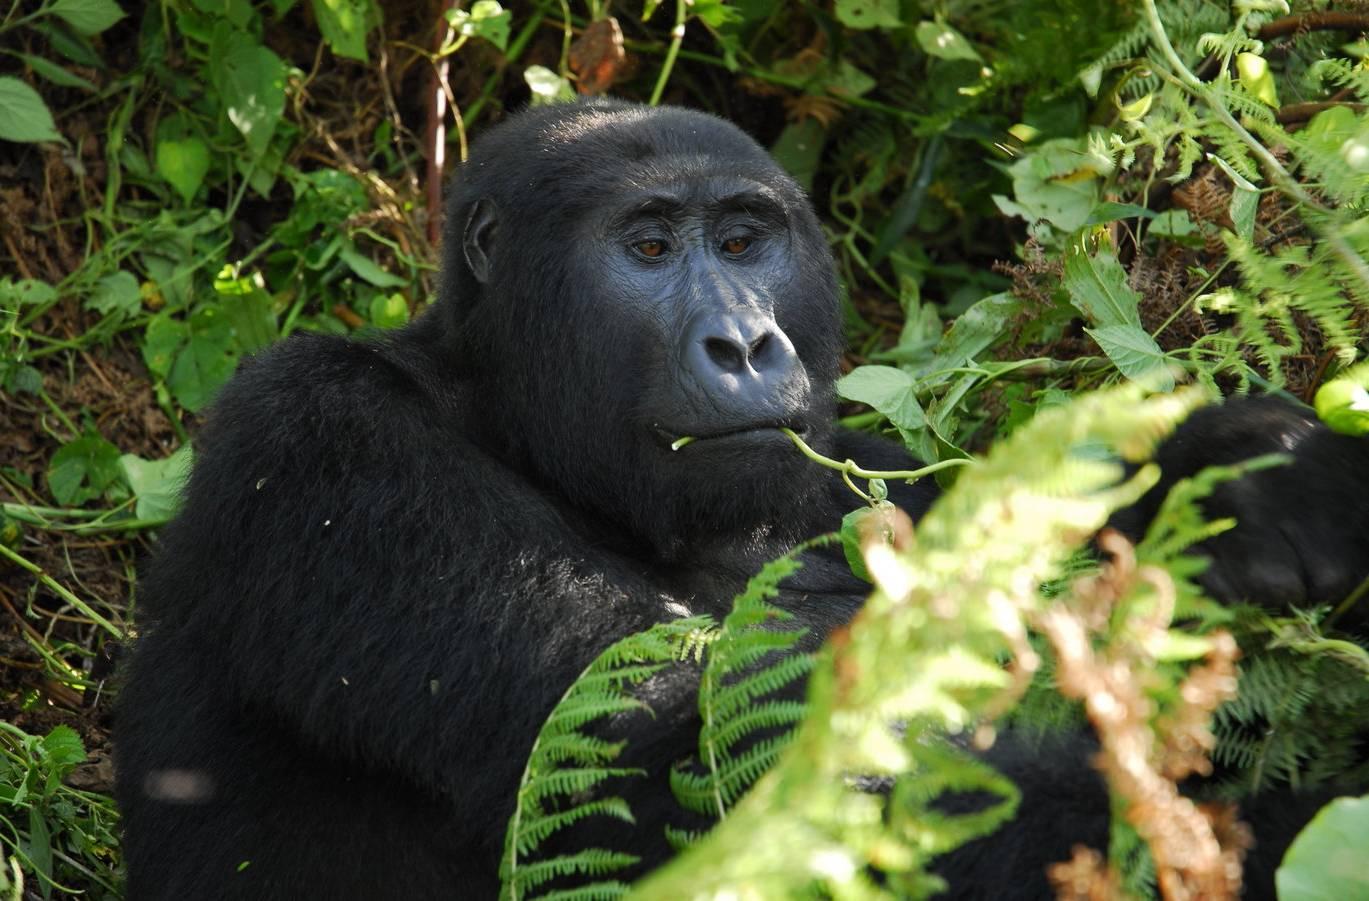 Uganda-Gorilla-by-Simon-Bellingham-e1566909420110